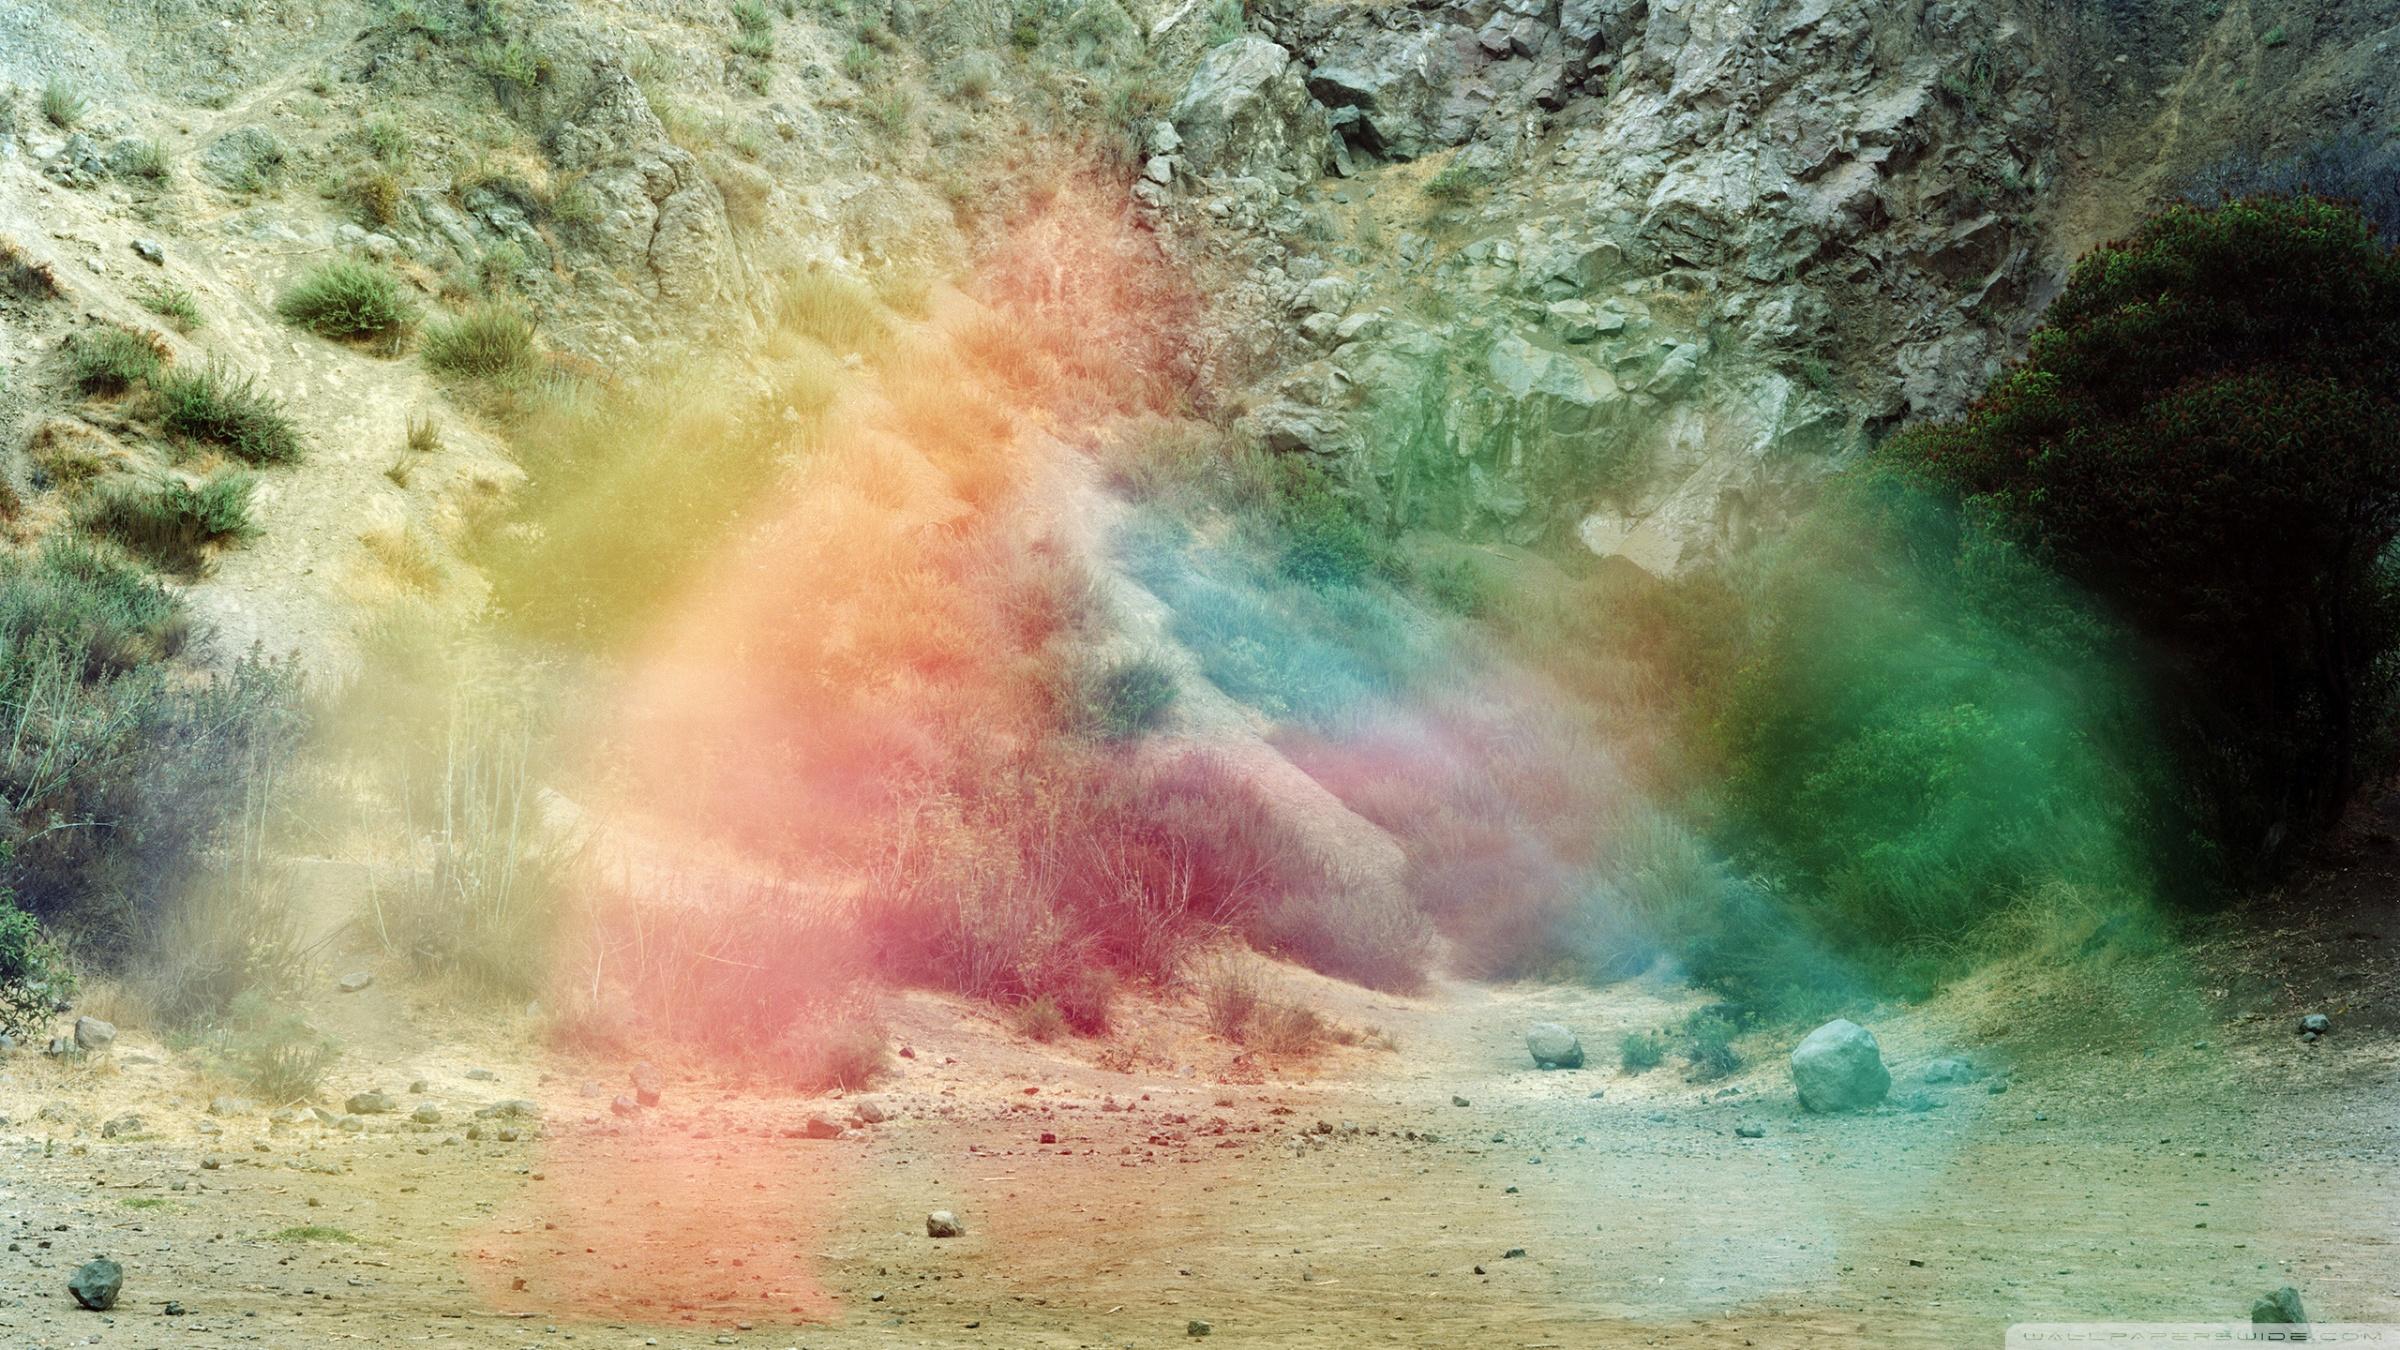 Magic_rainbow-wallpaper-2400x1350